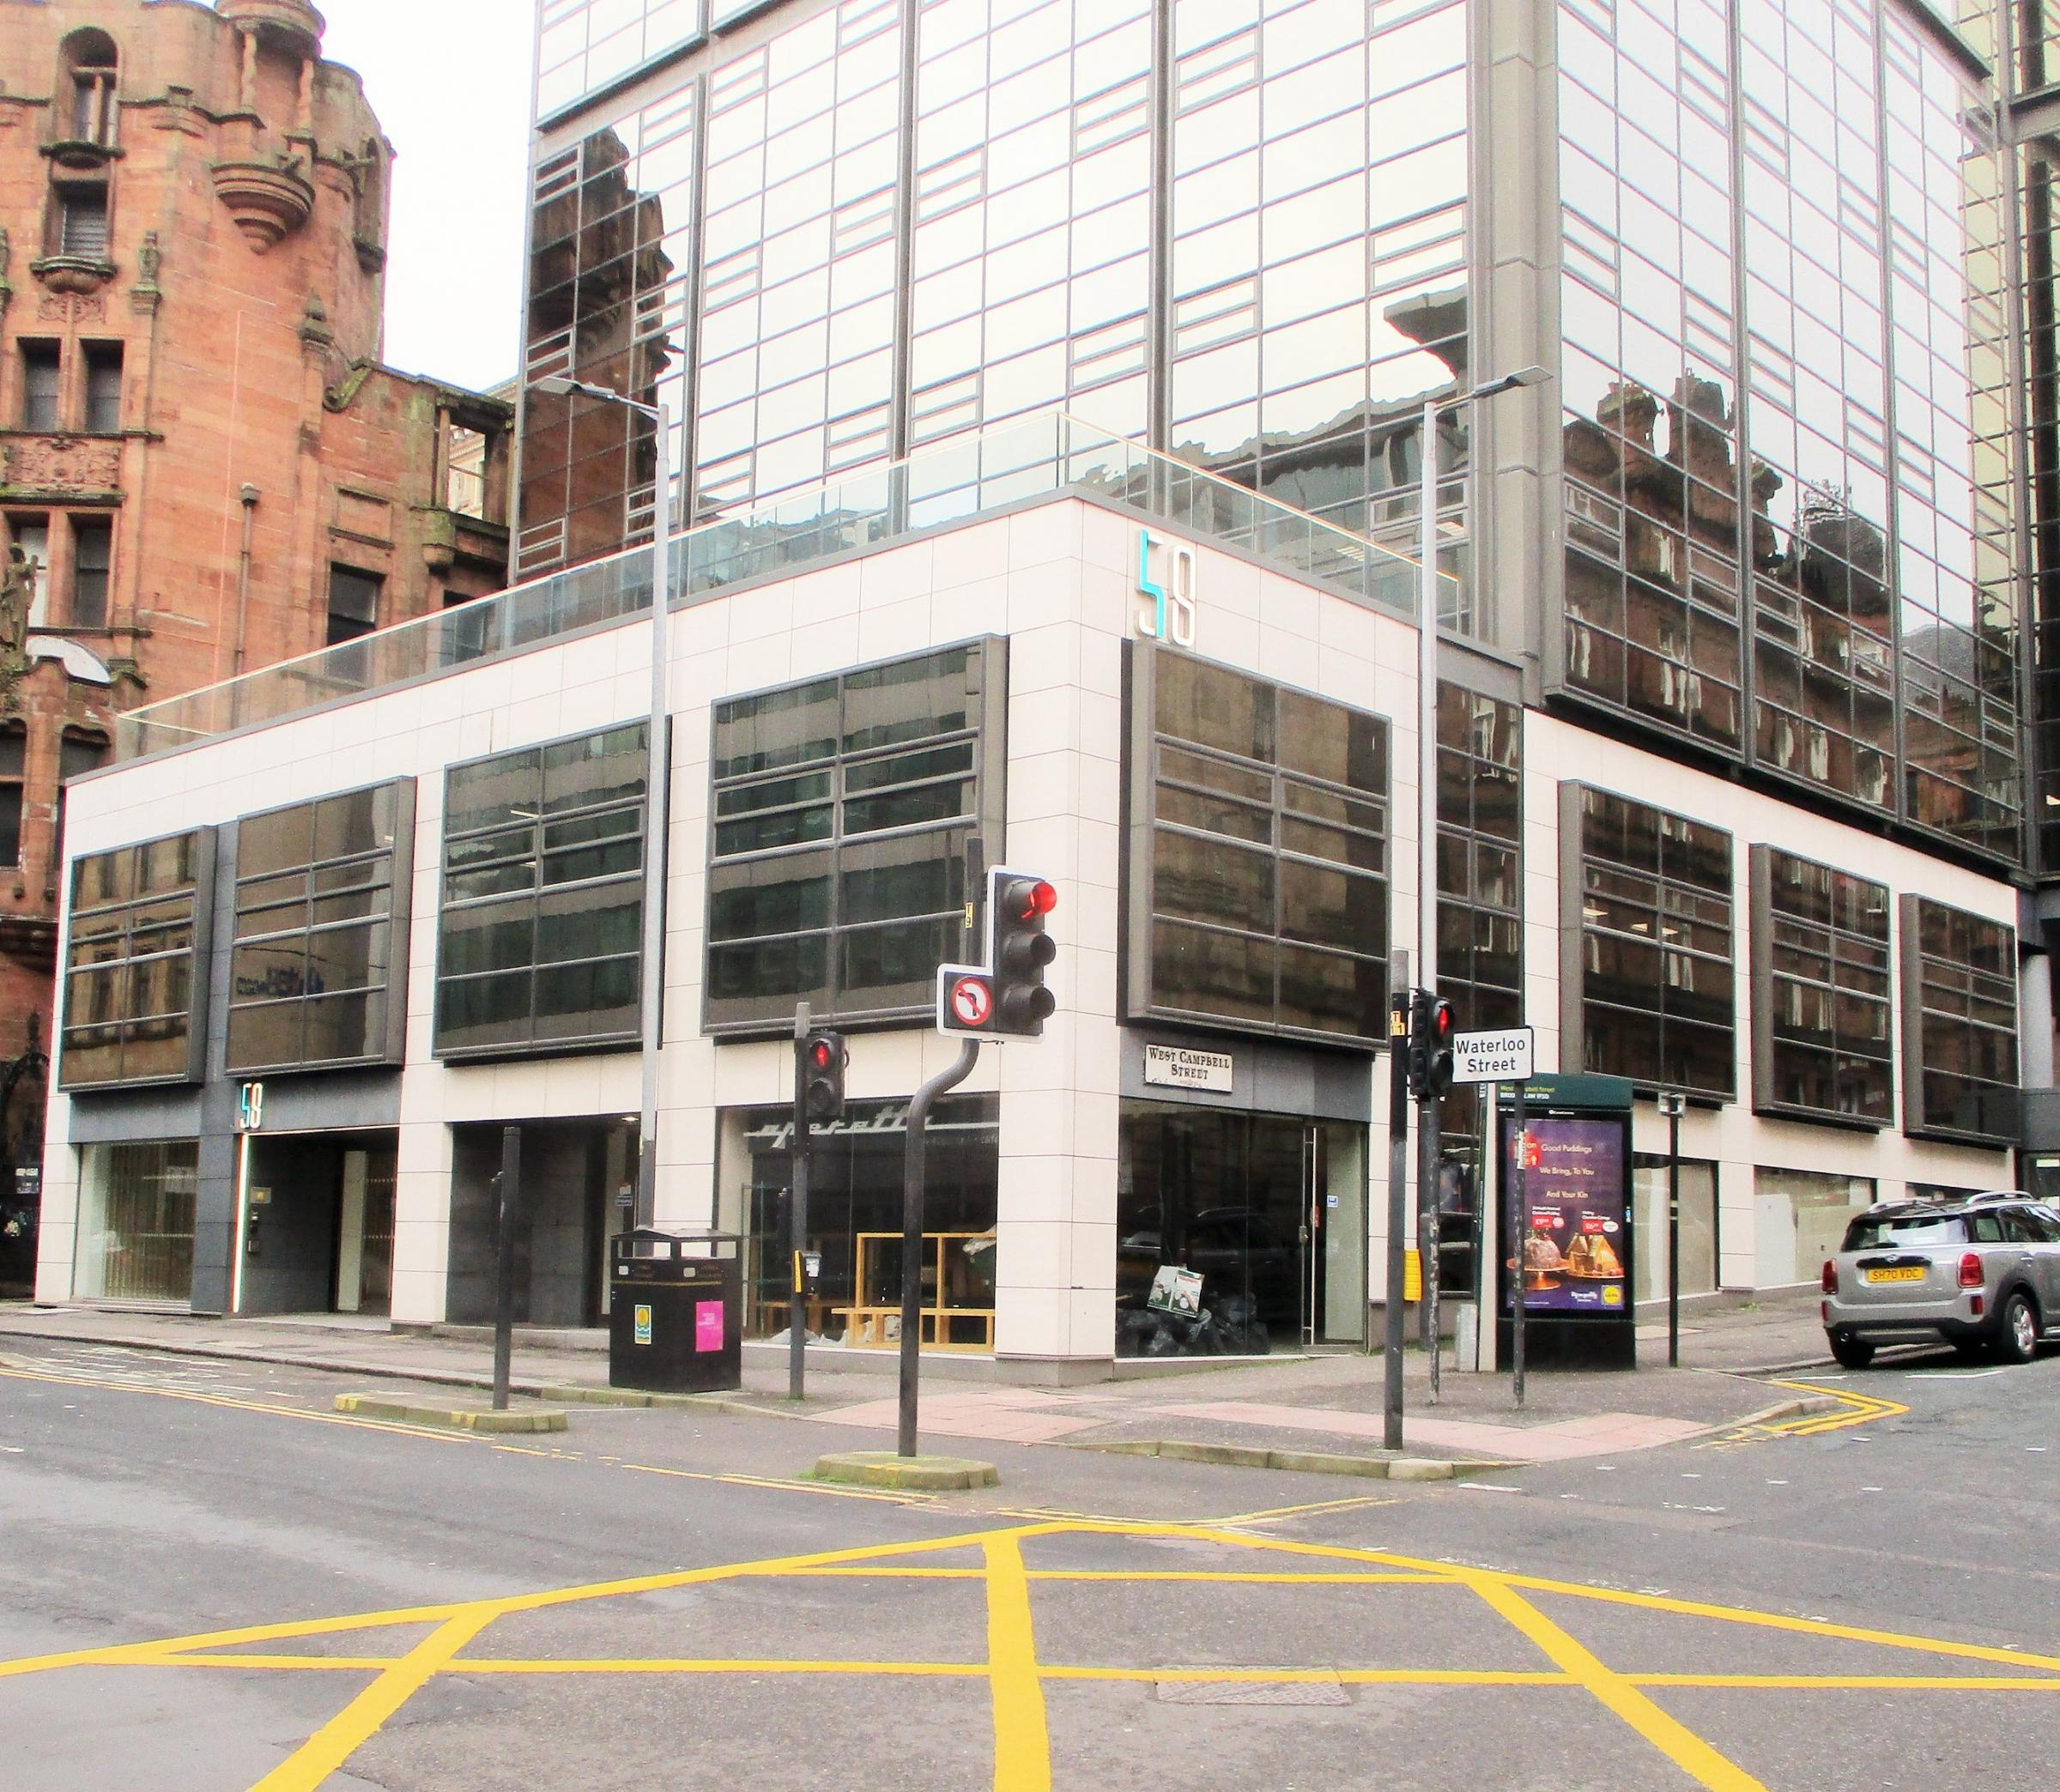 Ho Wong: Stage set for return of famous Glasgow restaurant